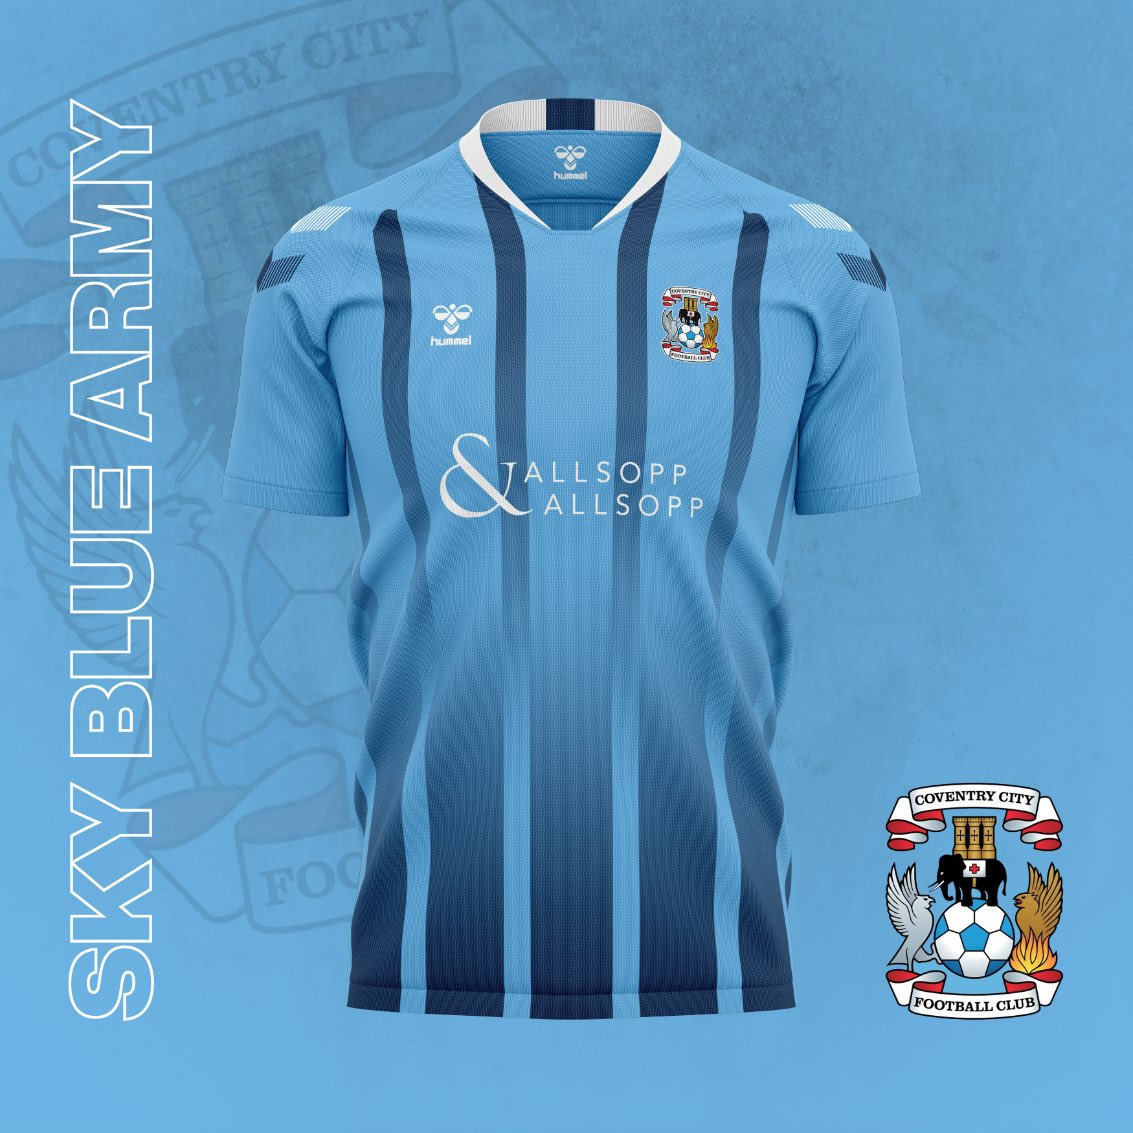 Coventry City Home Concept @lwccfc @CovCityLive @NiiLampteyShow @Coventry_City @SkyCcfc @SBitC_CCFC @ccfcshirts @TrueColoursKits #soccer #football #hummel #ccfc #pusb @hummel1923 #kitconcept https://t.co/XHKAgPDV9R